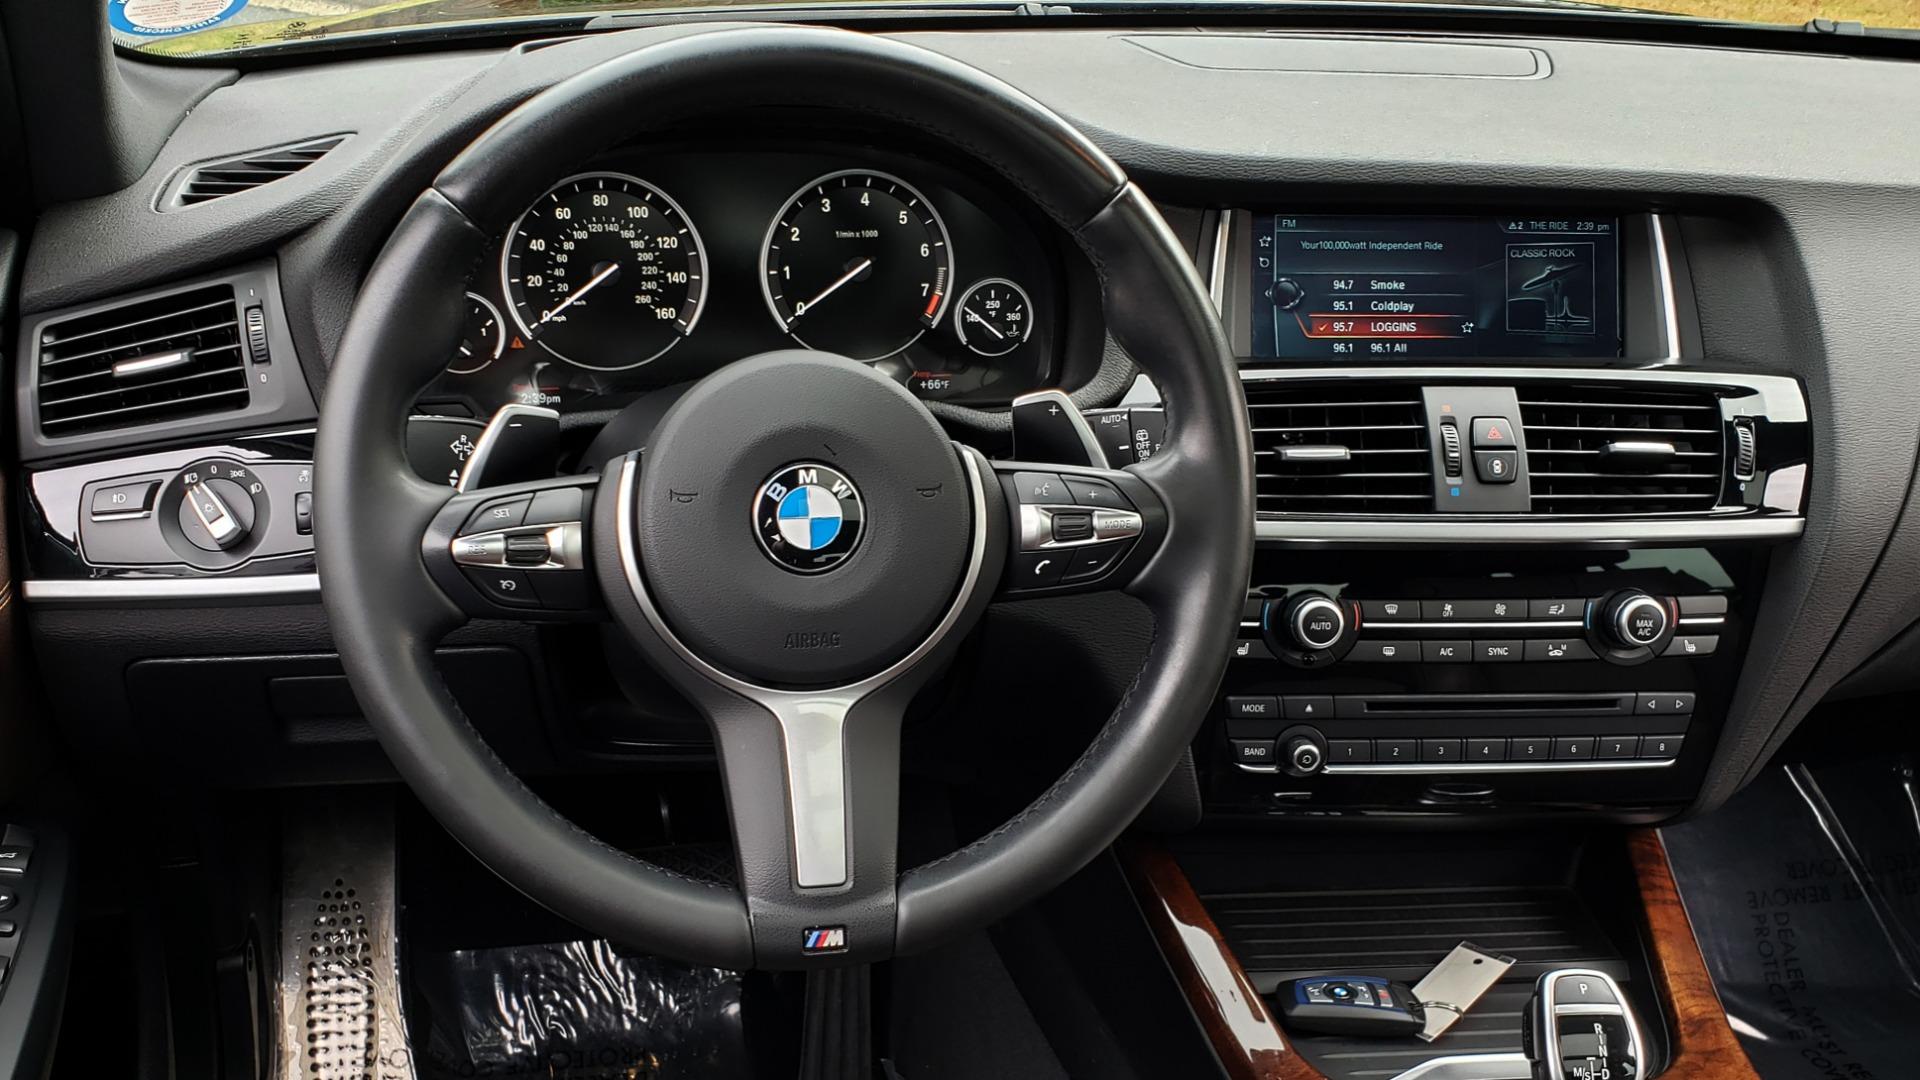 Used 2017 BMW X3 XDRIVE35I M-SPORT / DRVR ASST PLUS / TECHNOLOGY / HUD / BLIND SPOT for sale Sold at Formula Imports in Charlotte NC 28227 39